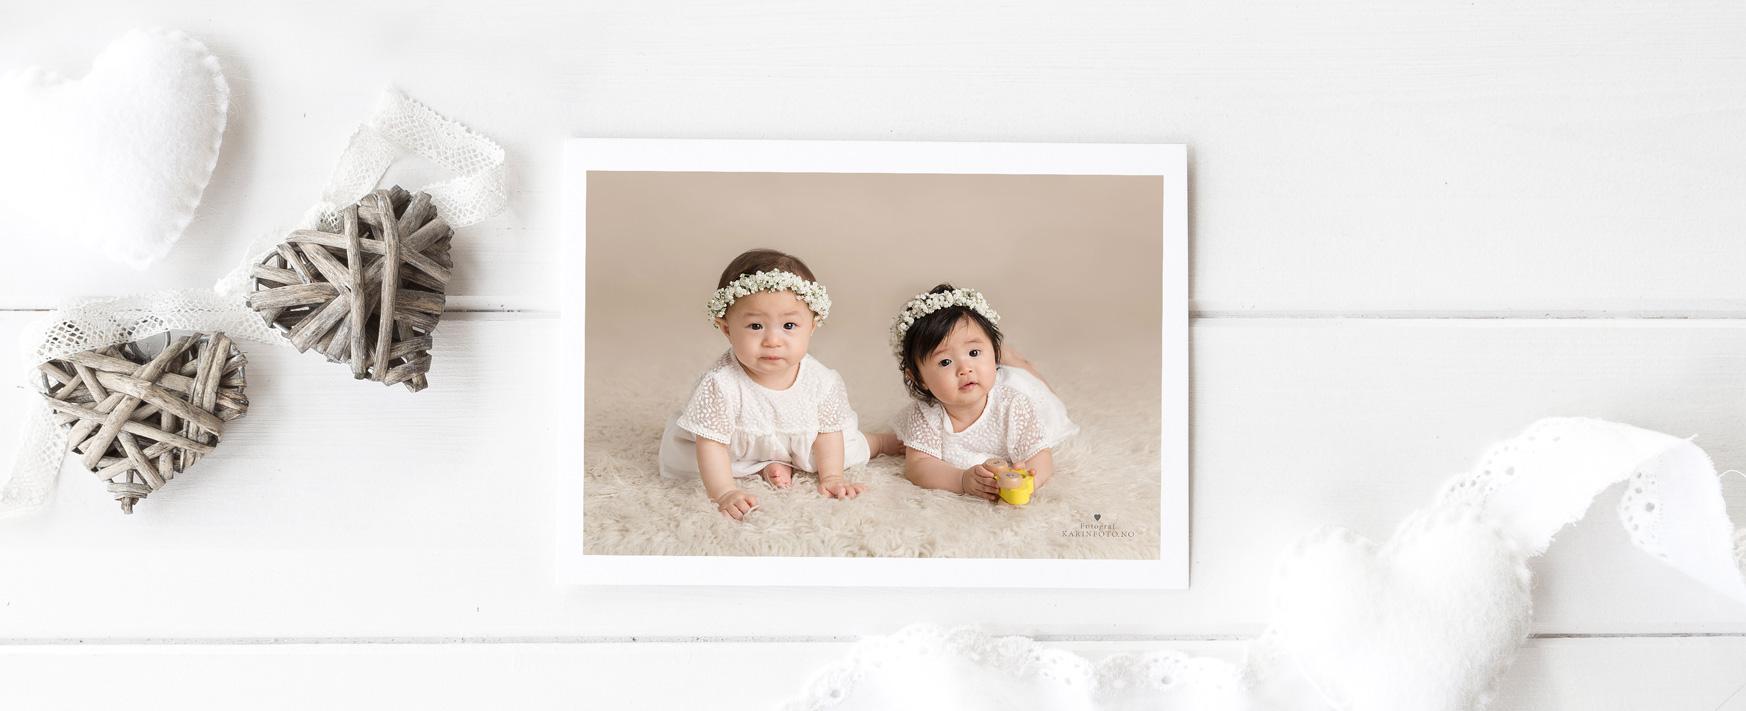 Fotograf Karin Pedersen,barnefotografering,babyfotografering,nyfødtfotografering,familiefotografering,sarpsborg,fredrikstad,moss,halden,oslo,vestby